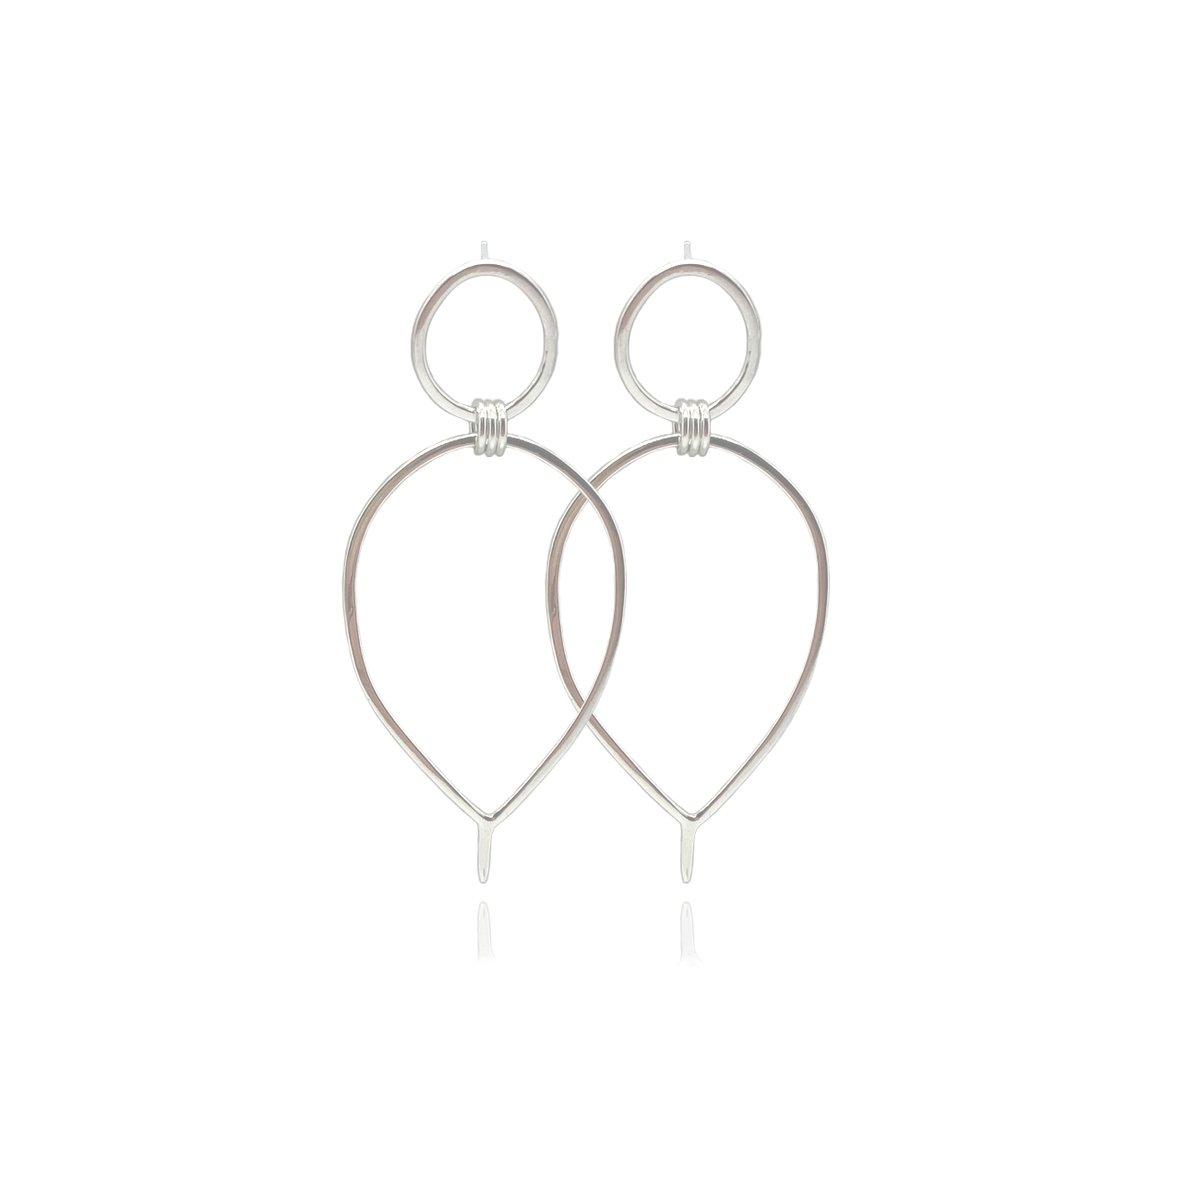 Image of Silver Lunaria earrings